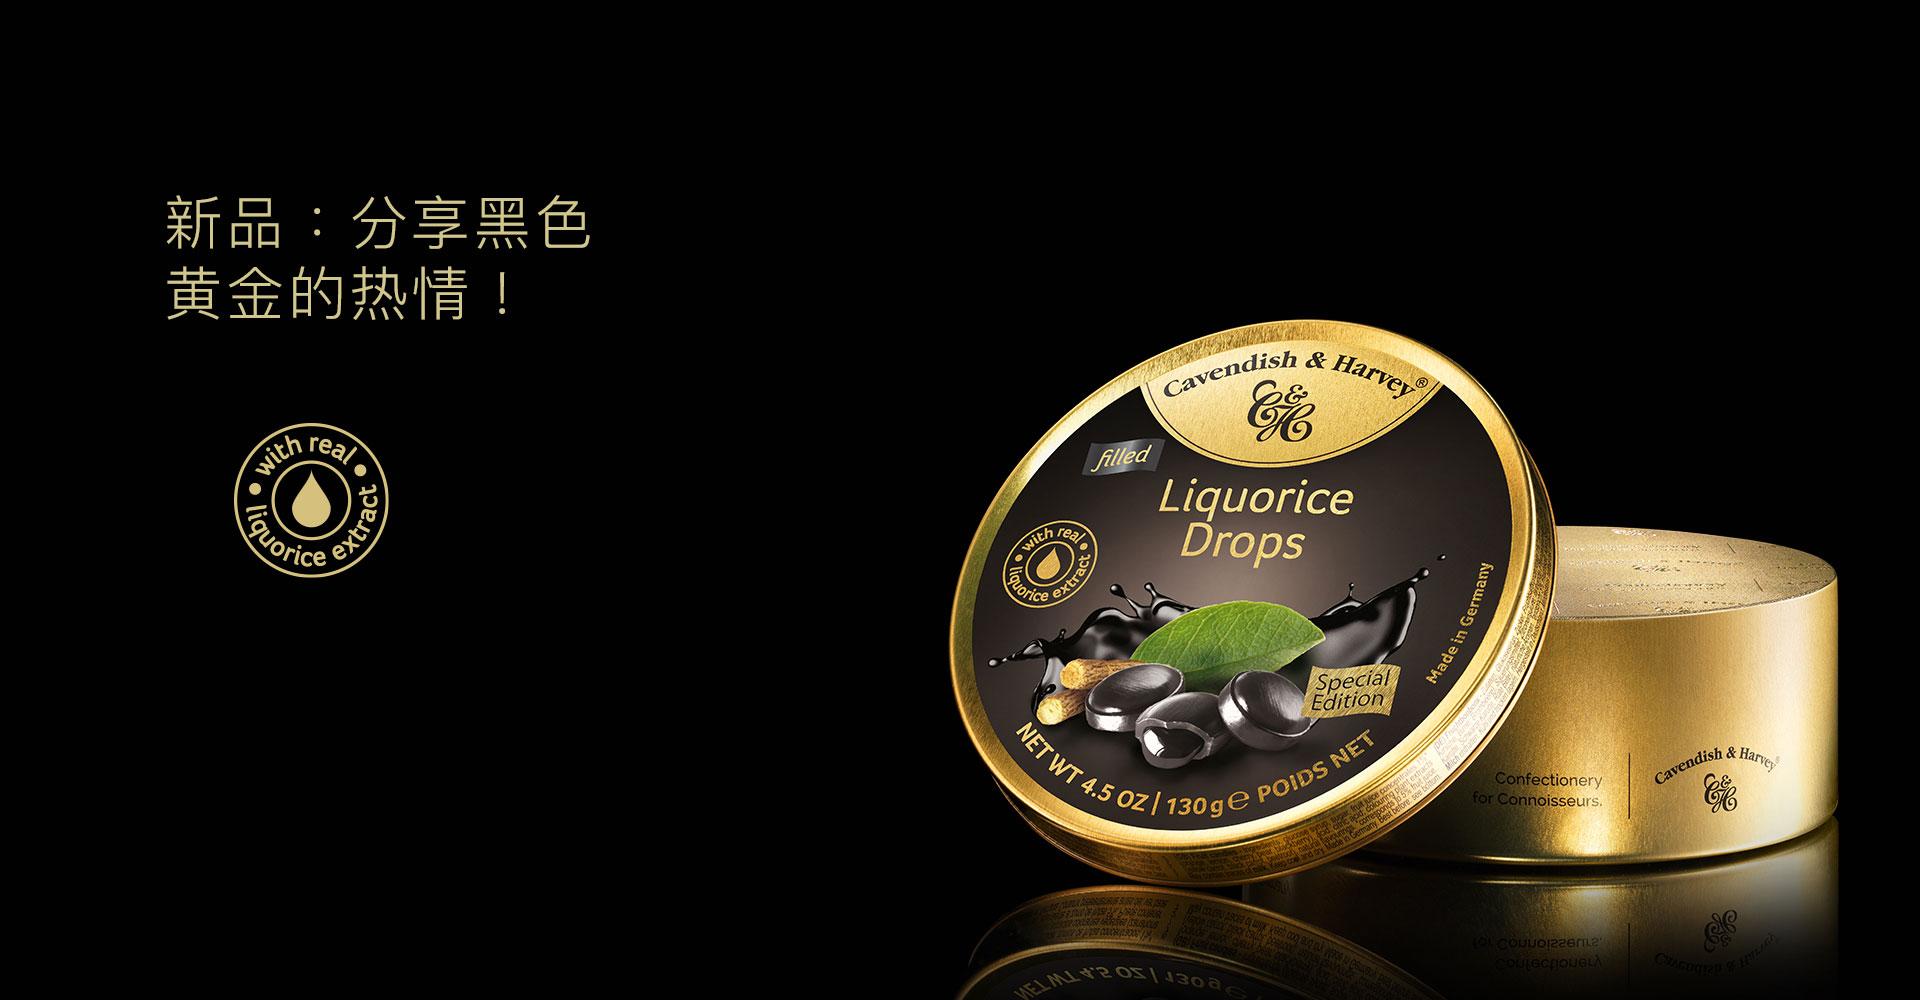 Liquorice Drops